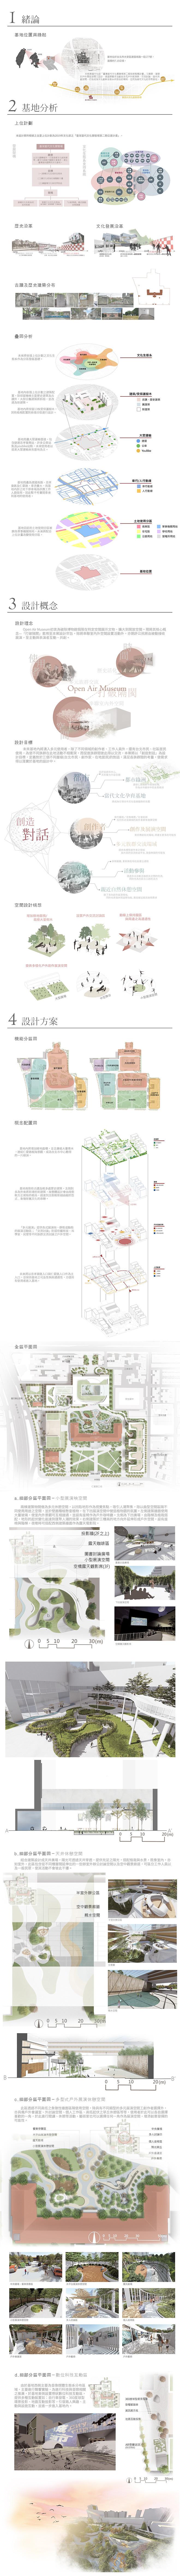 Intersection 台灣當代文化實驗場開放空間規劃設計-作品內容.jpg